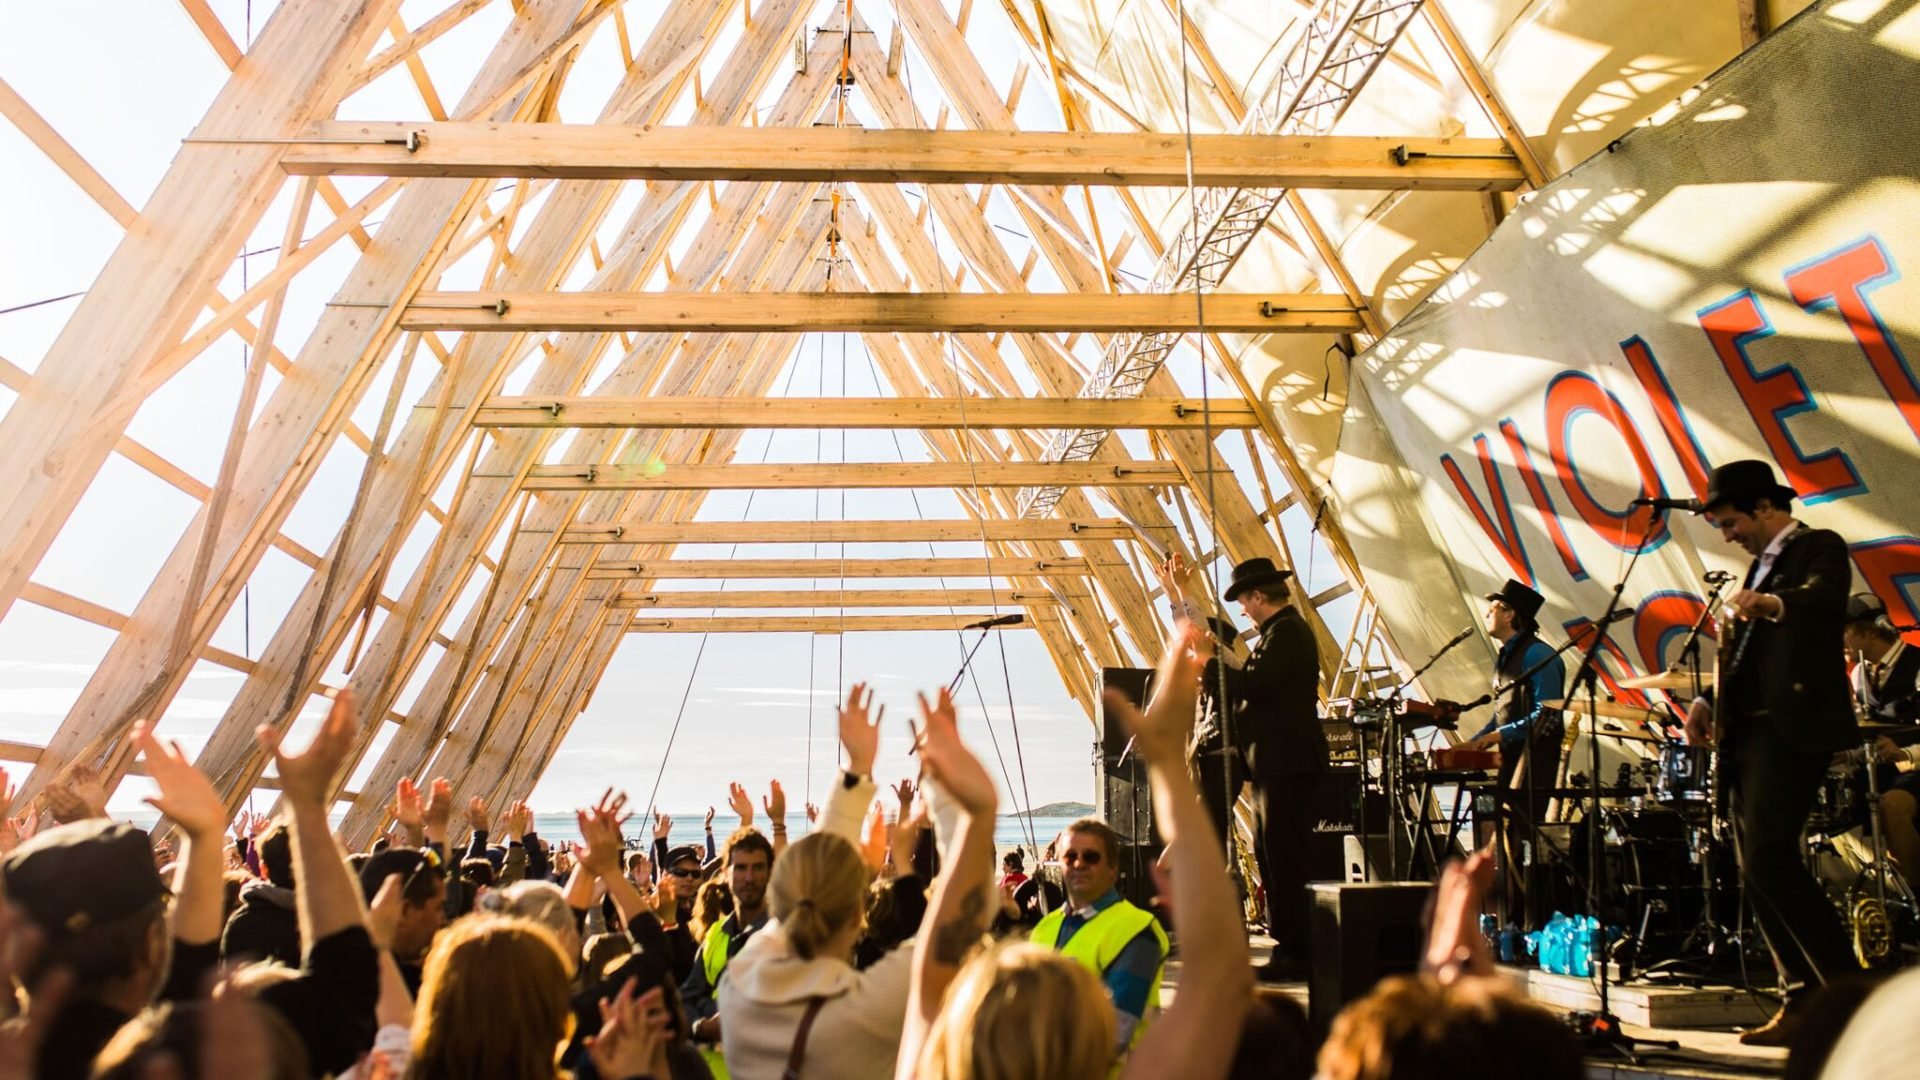 Masse folk på festival og god stemning.